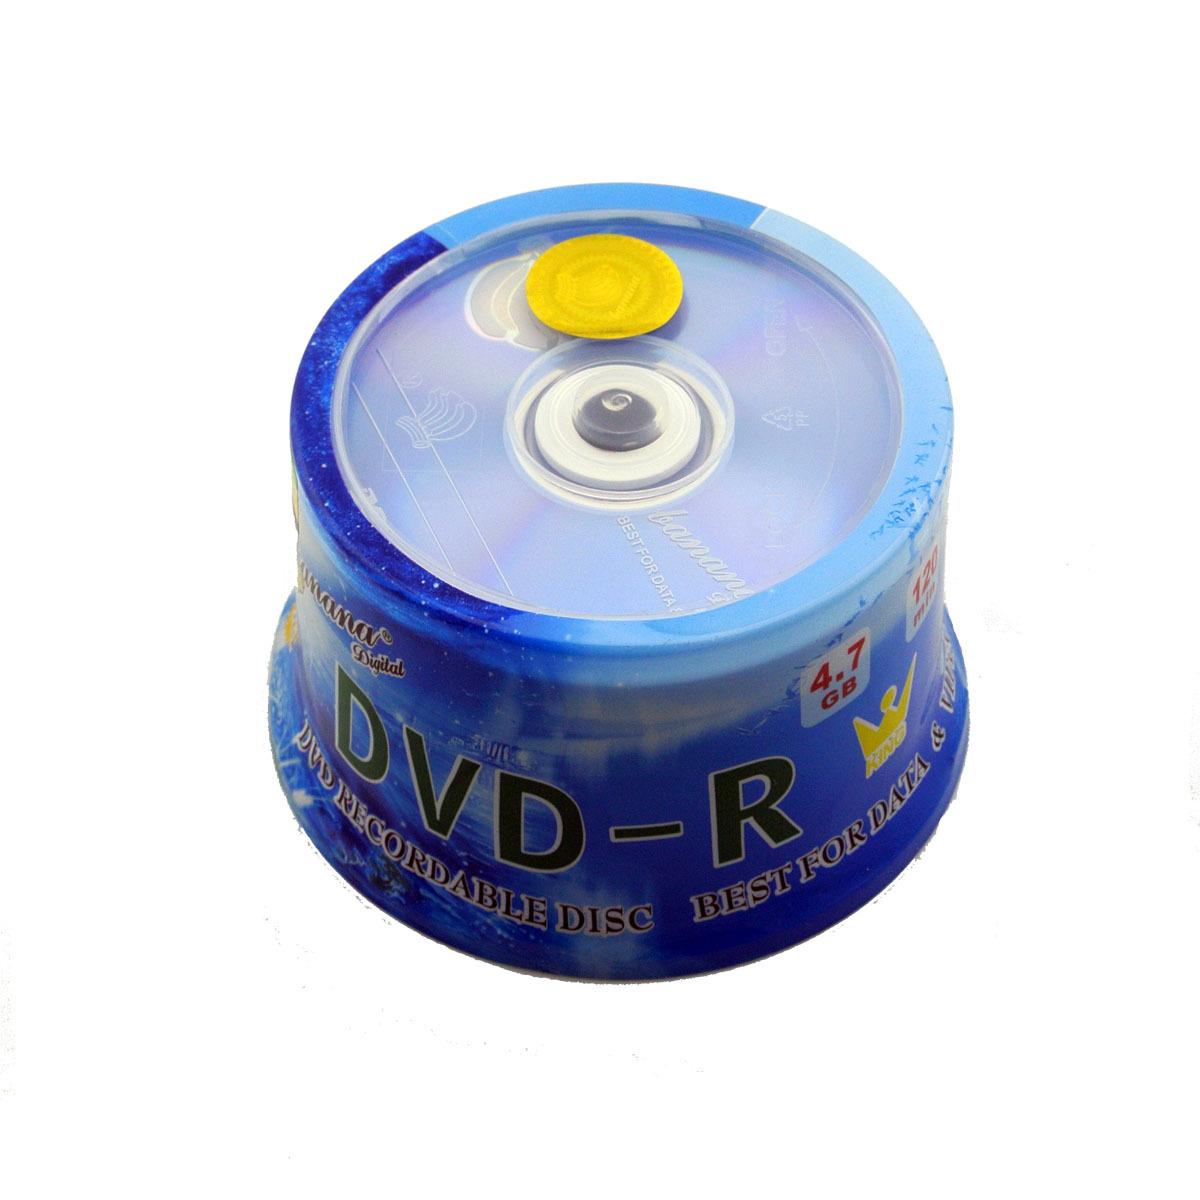 Dvd discs blank cd dvd 50 softcover dvd cd r dvd-r(China (Mainland))